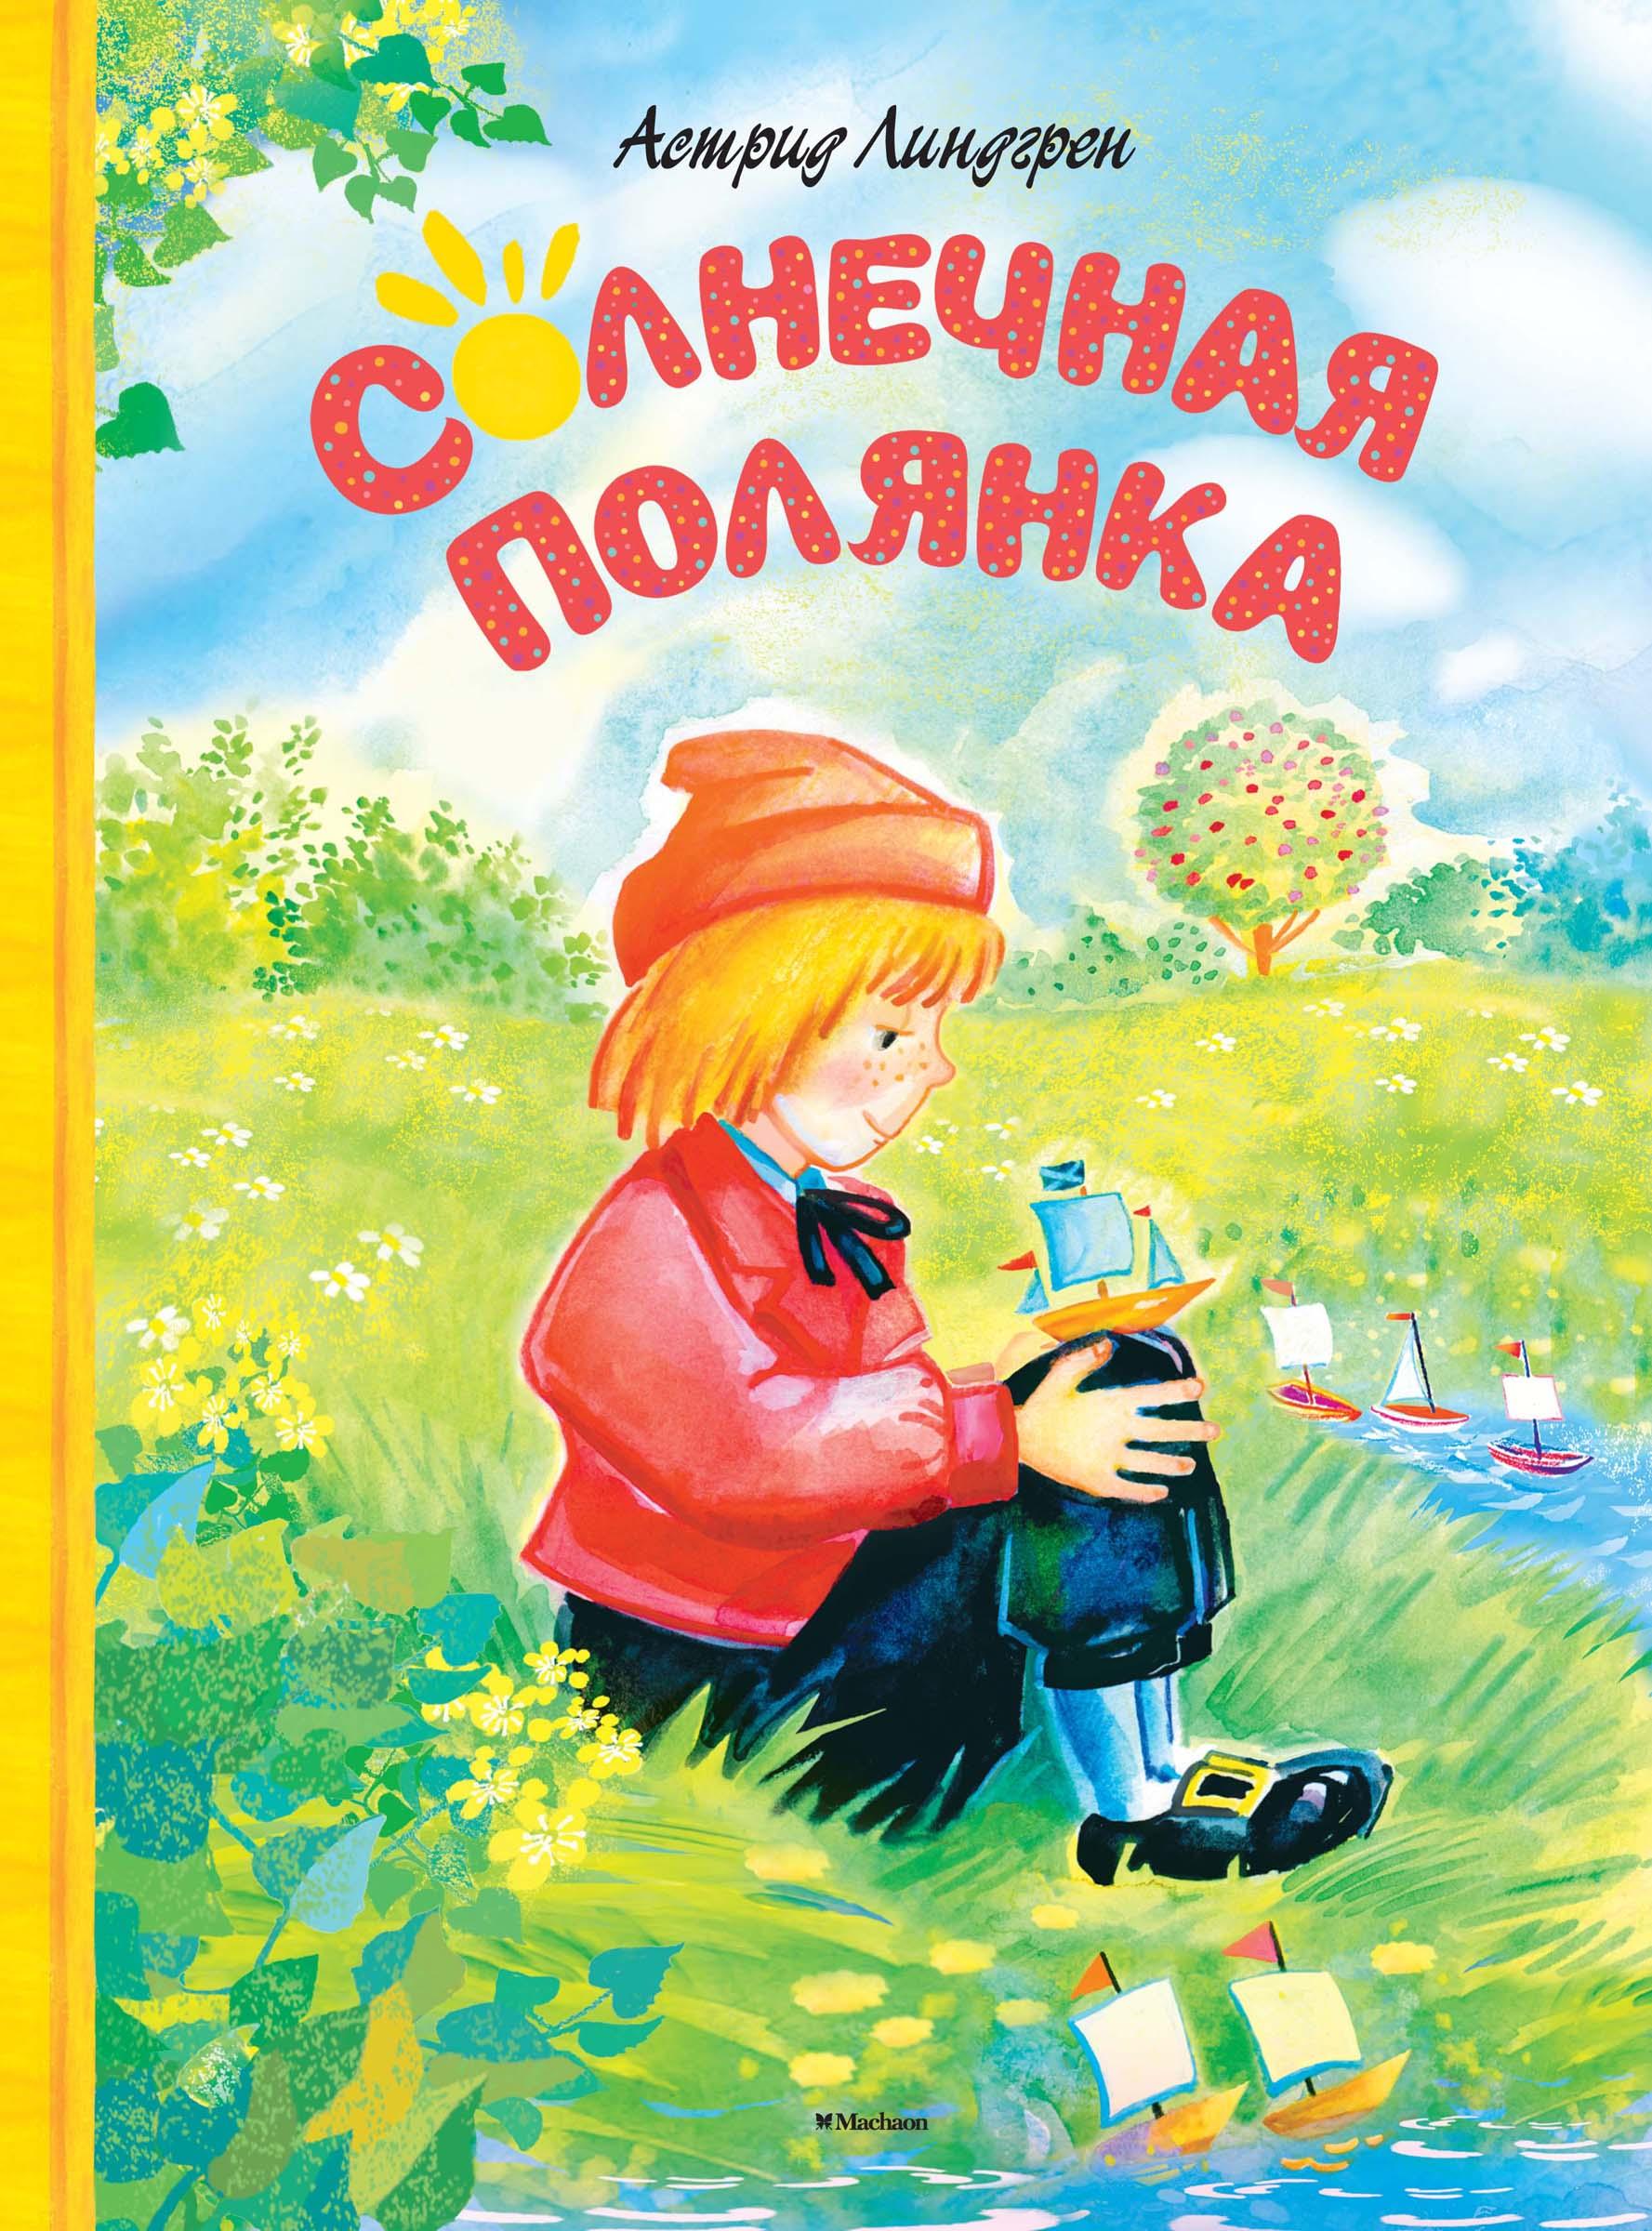 Астрид Линдгрен Солнечная Полянка (сборник) махаон сказки солнечная полянка а линдгрен